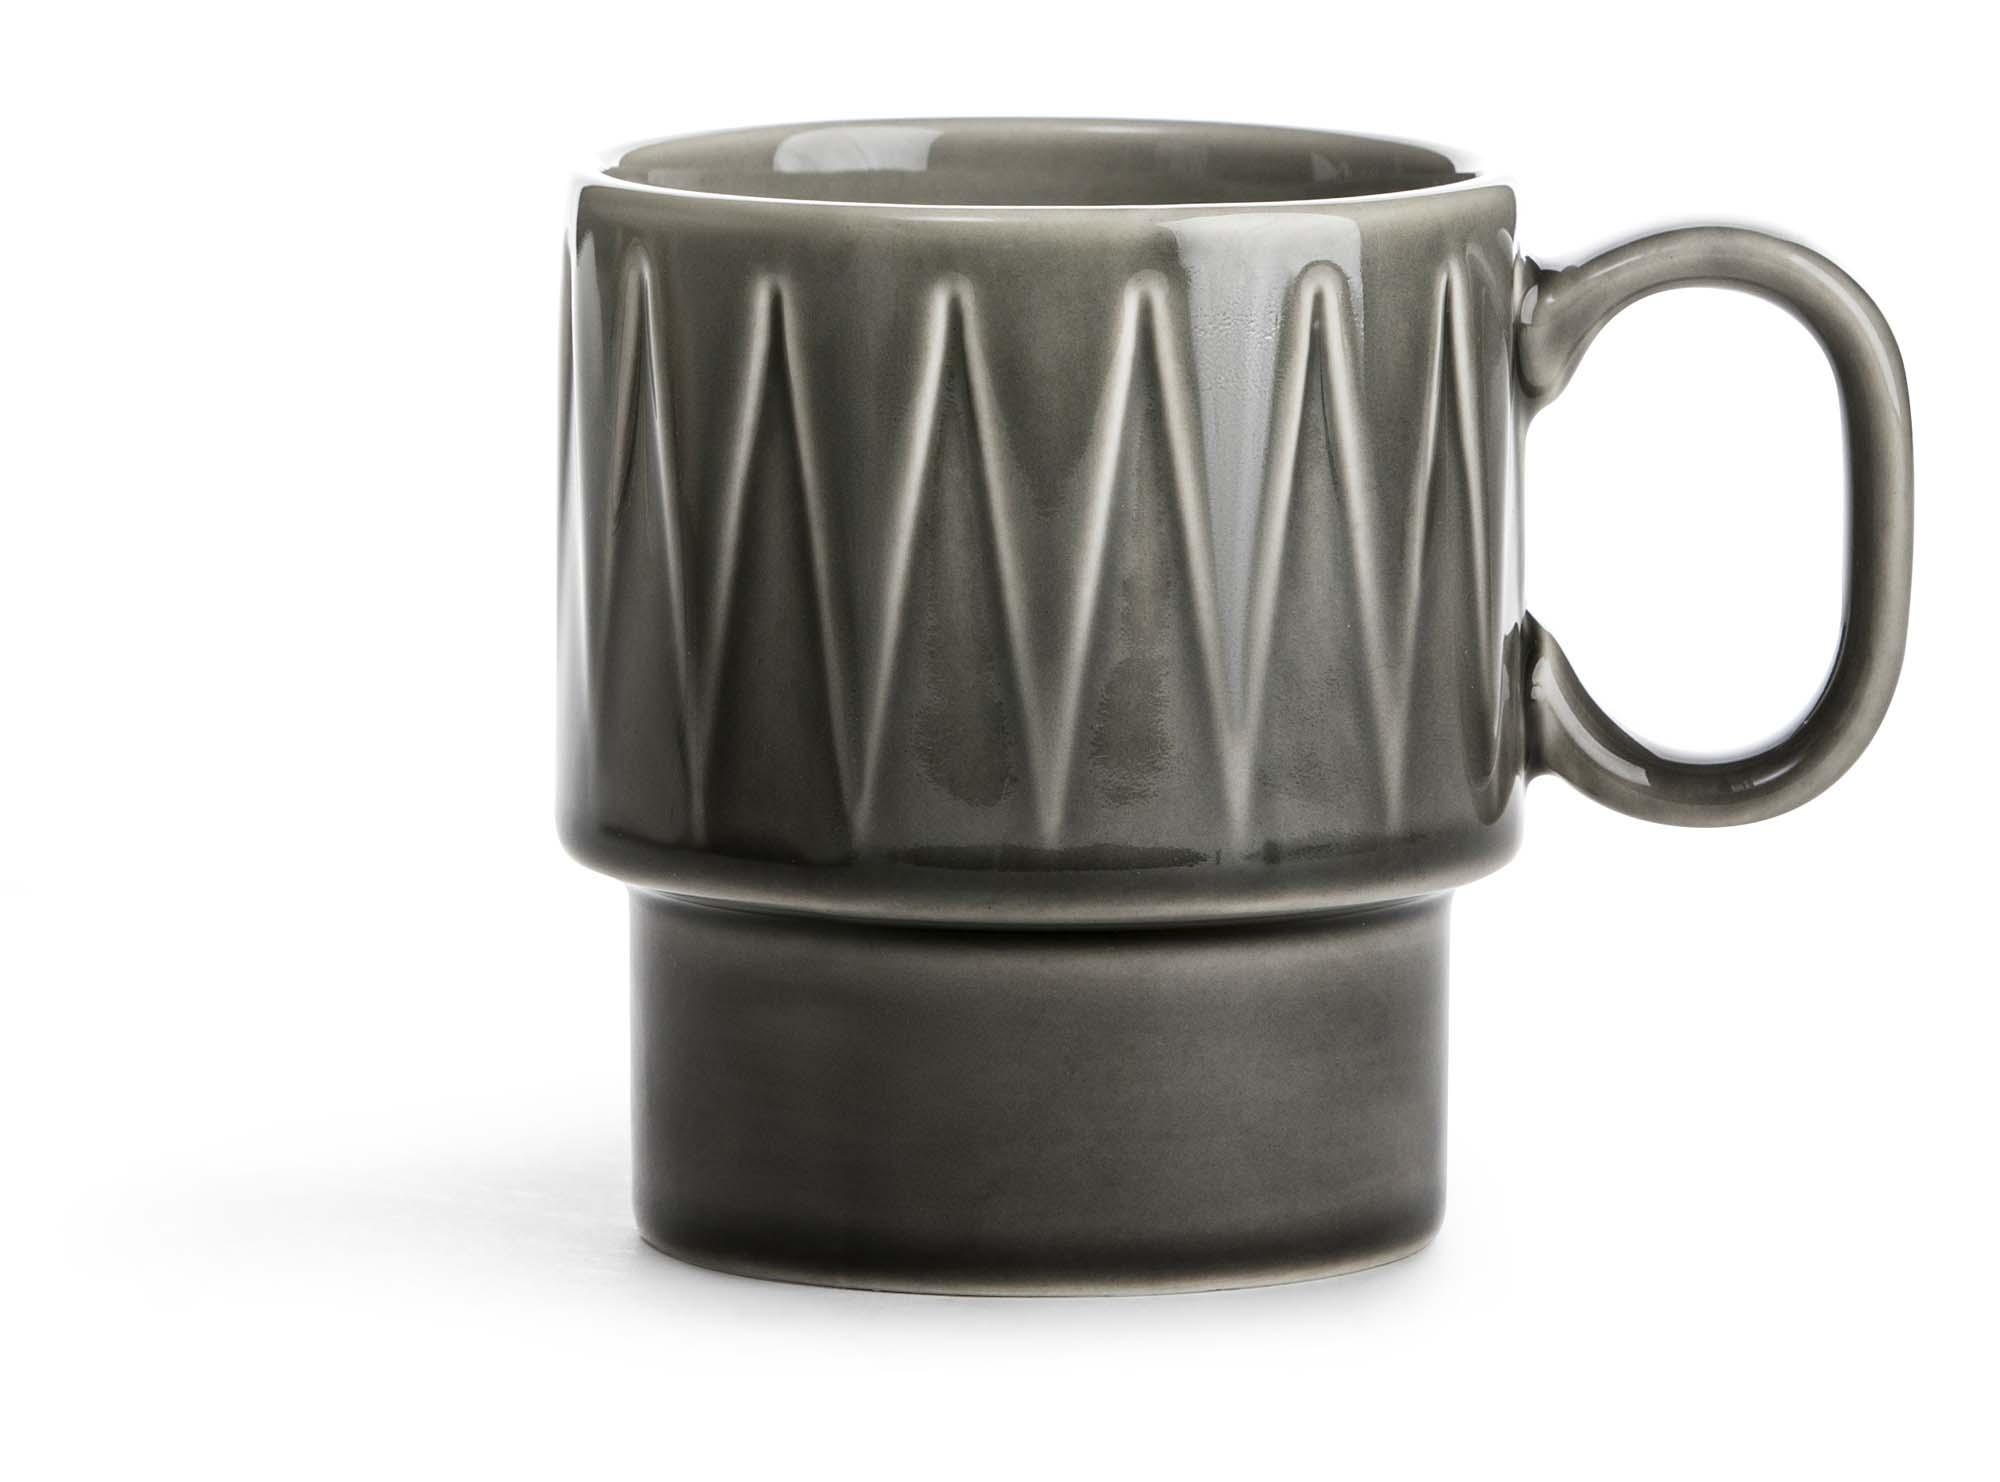 Sagaform Coffee & More kaffekrus grå